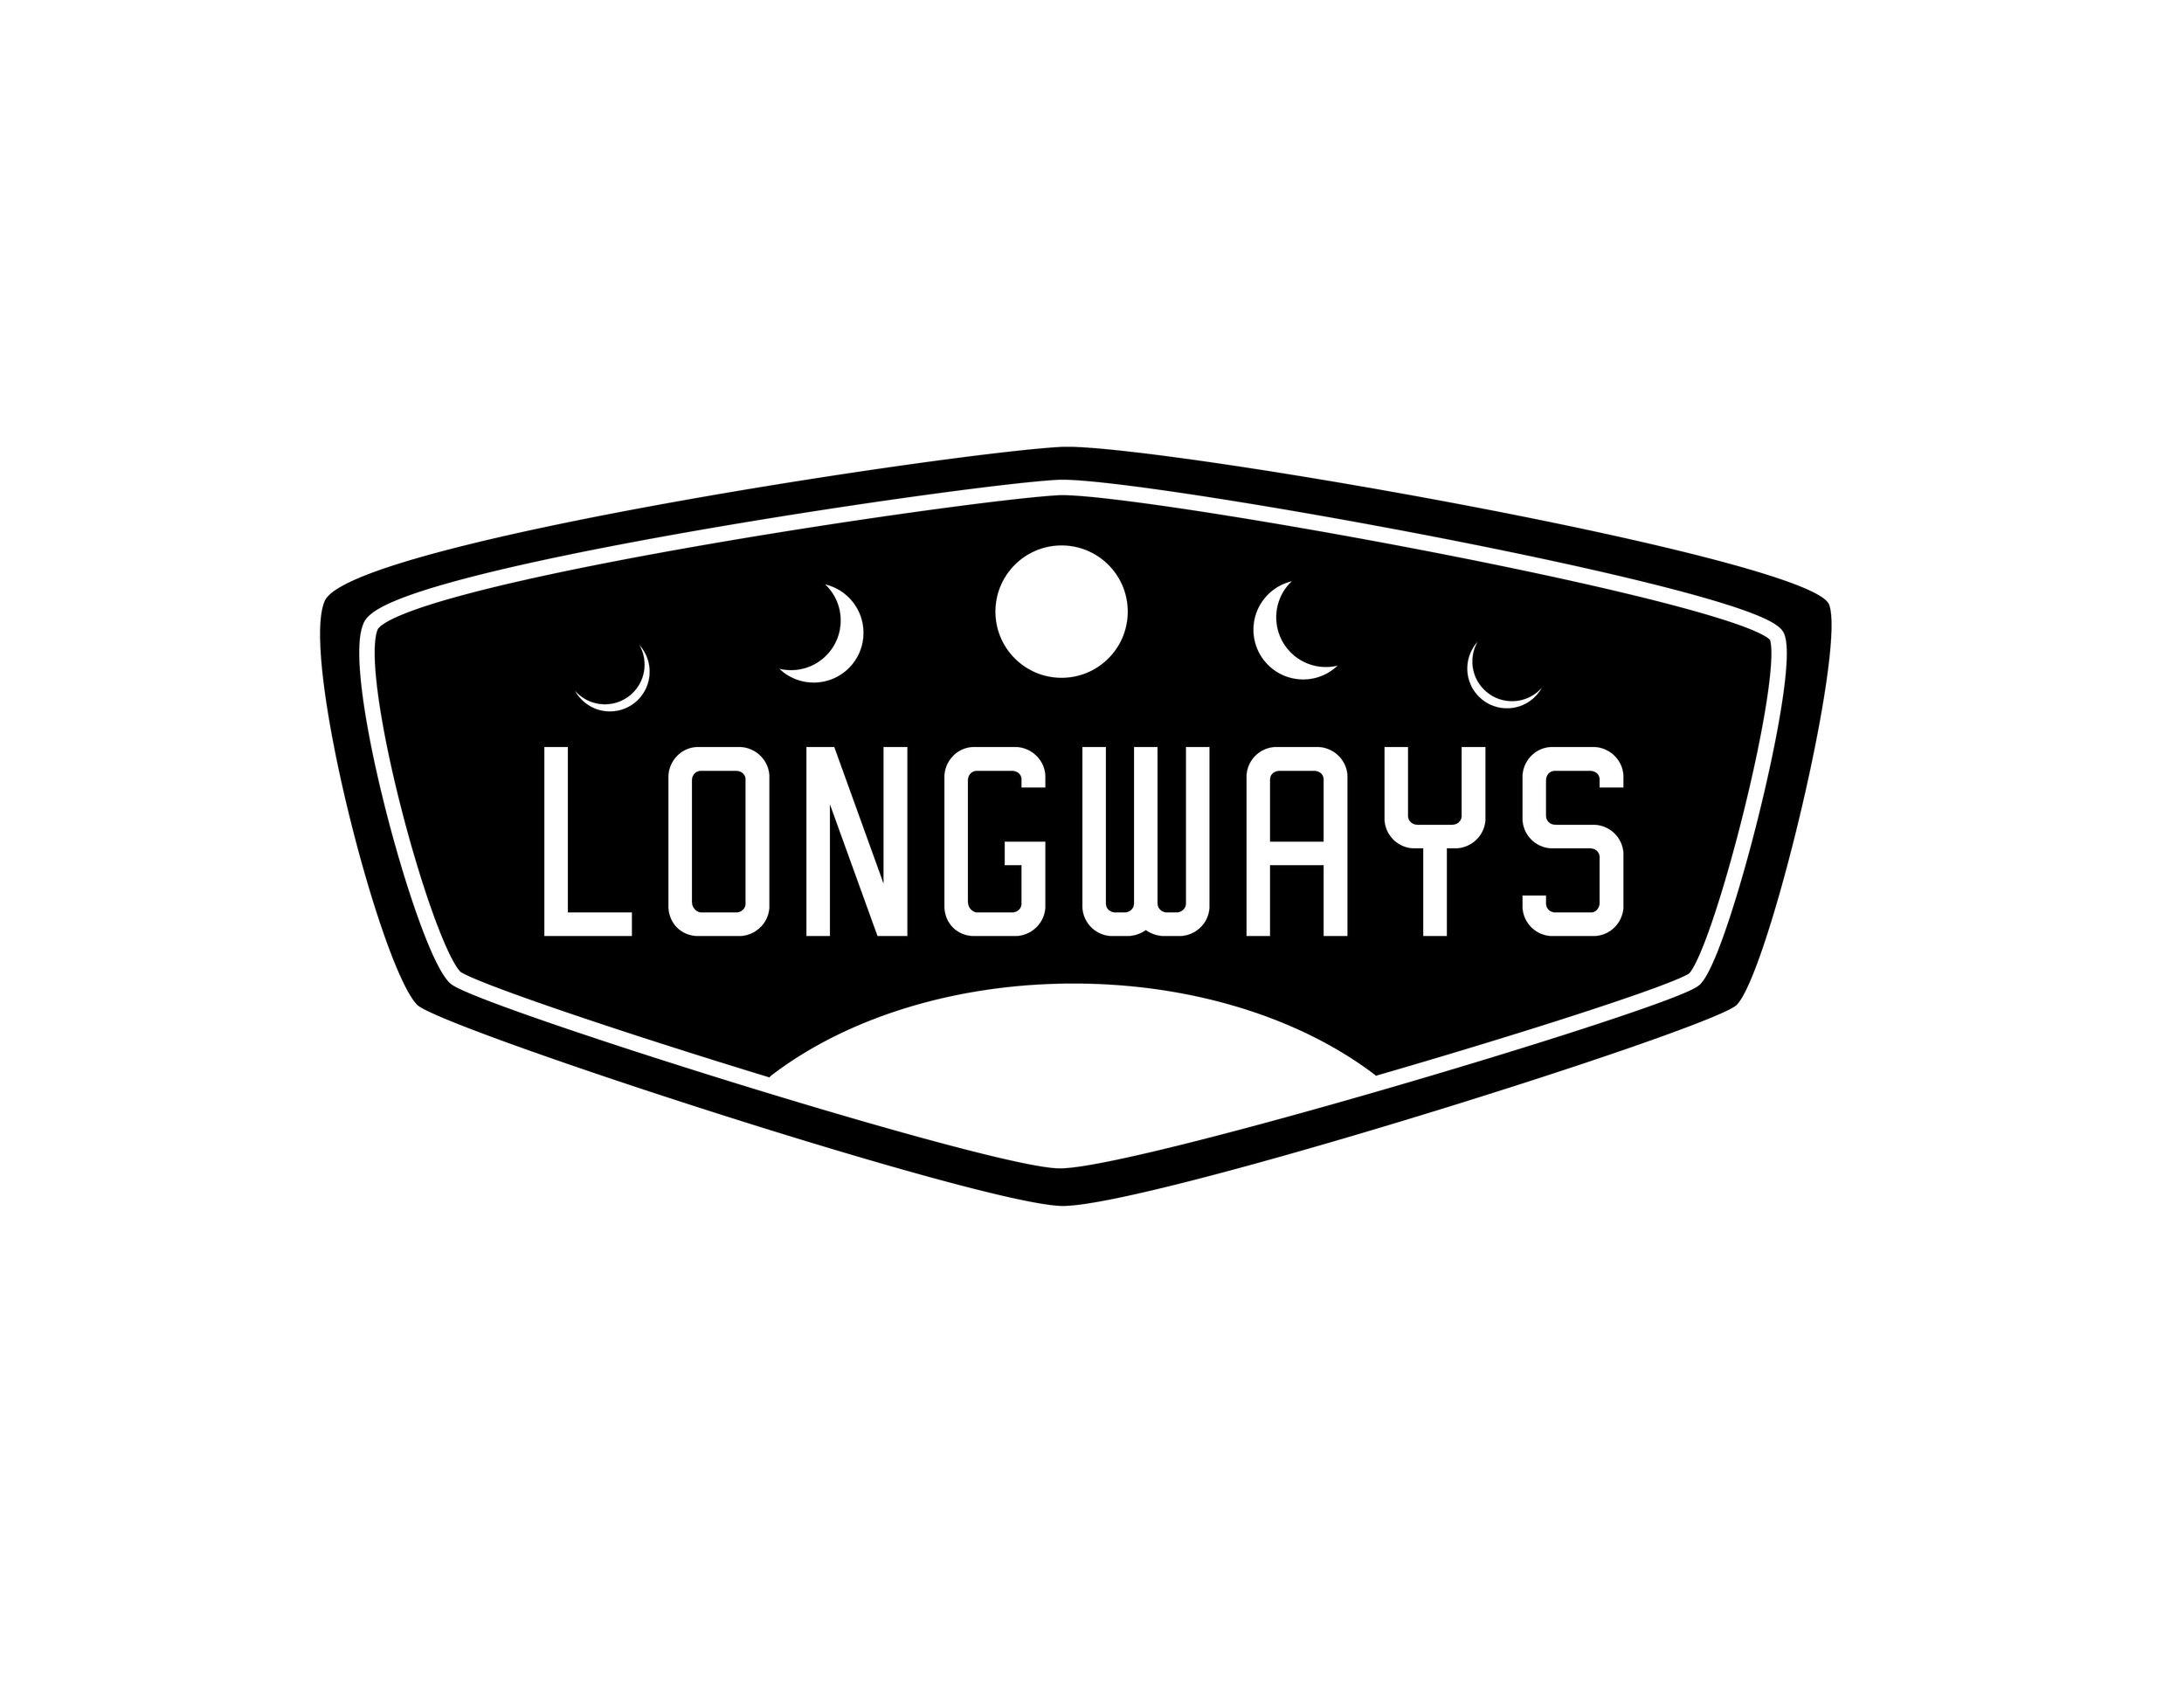 longways logo.jpg